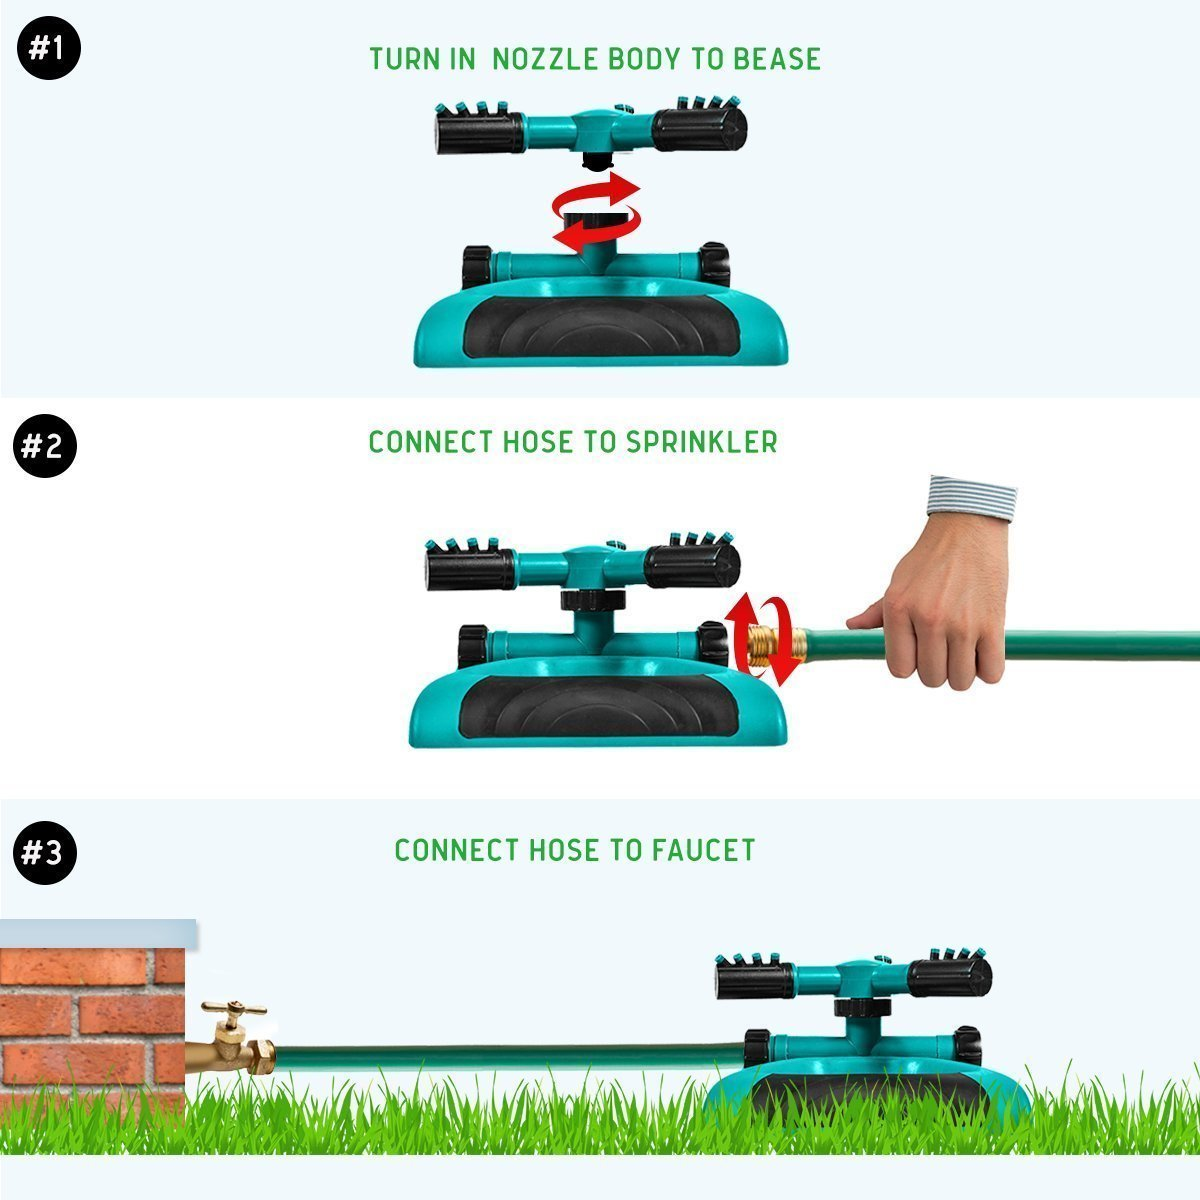 Lawn Sprinkler -Garden Sprinklers Automatic 360 Rotating Adjustable Garden Hose Watering Sprinkler System,Covering Large Area with Leak Free Design Durable 3 Arm Sprayer(Green) by Geelyda (Image #4)